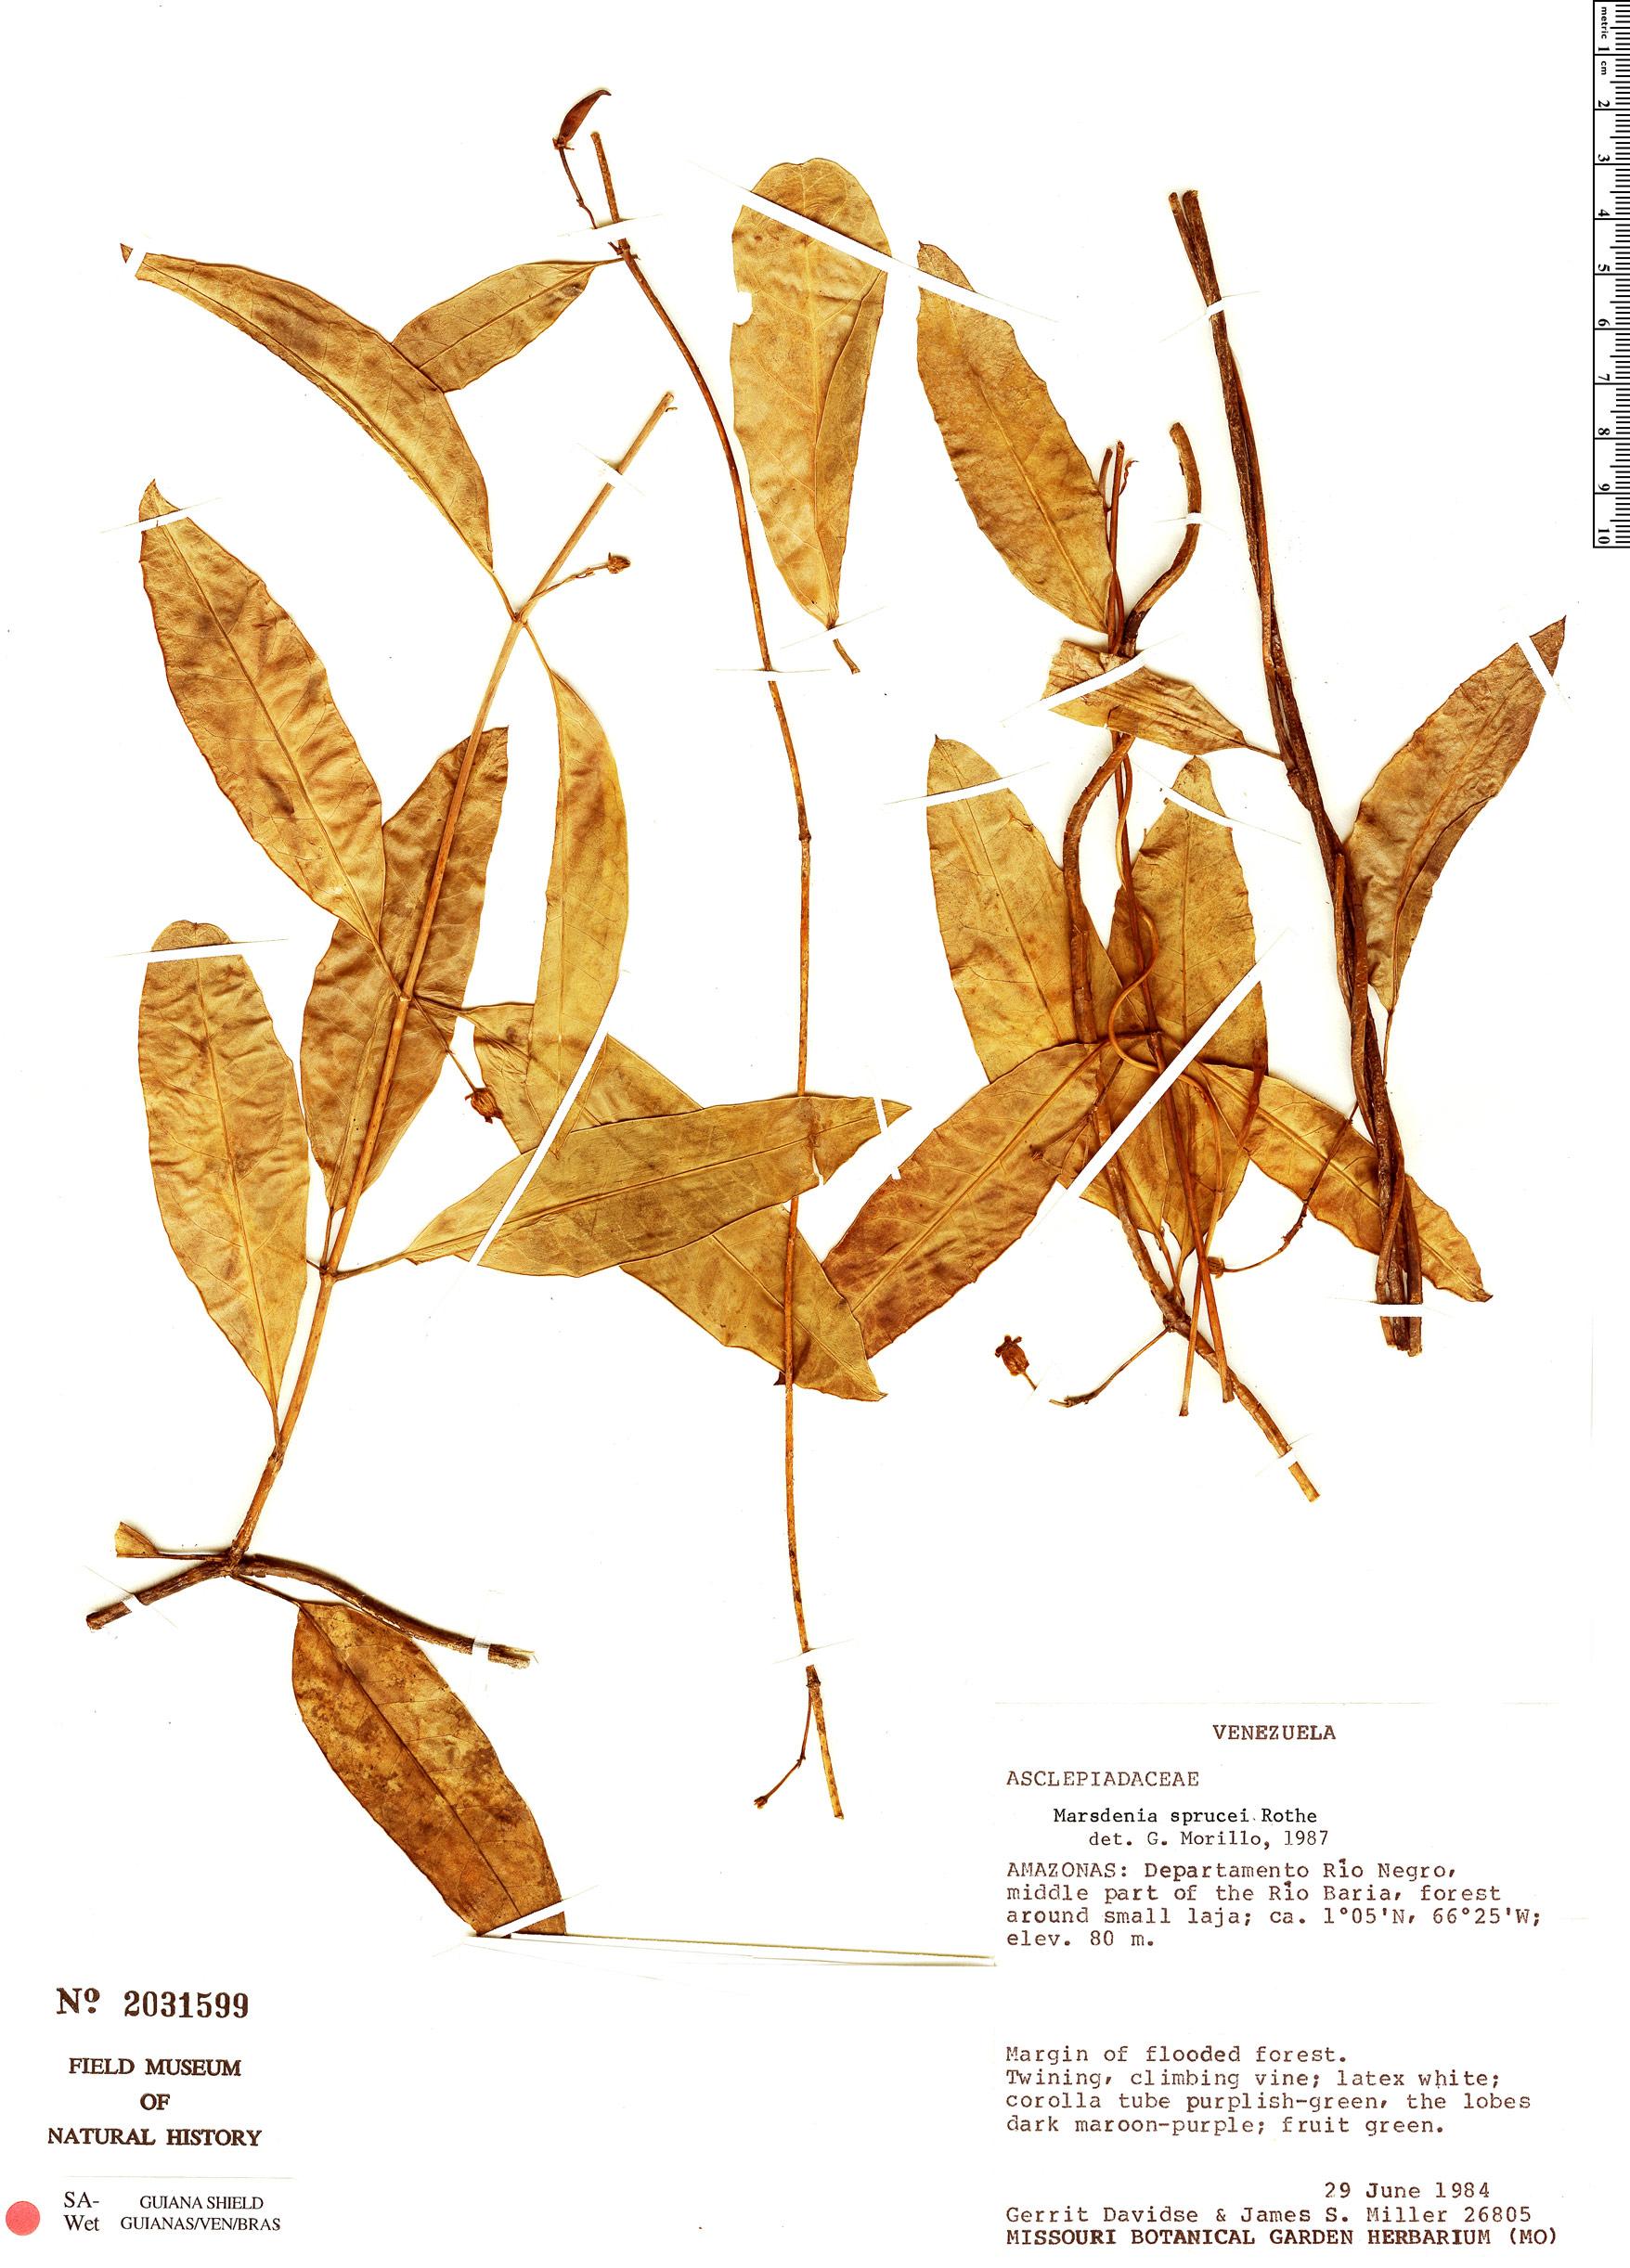 Specimen: Marsdenia sprucei